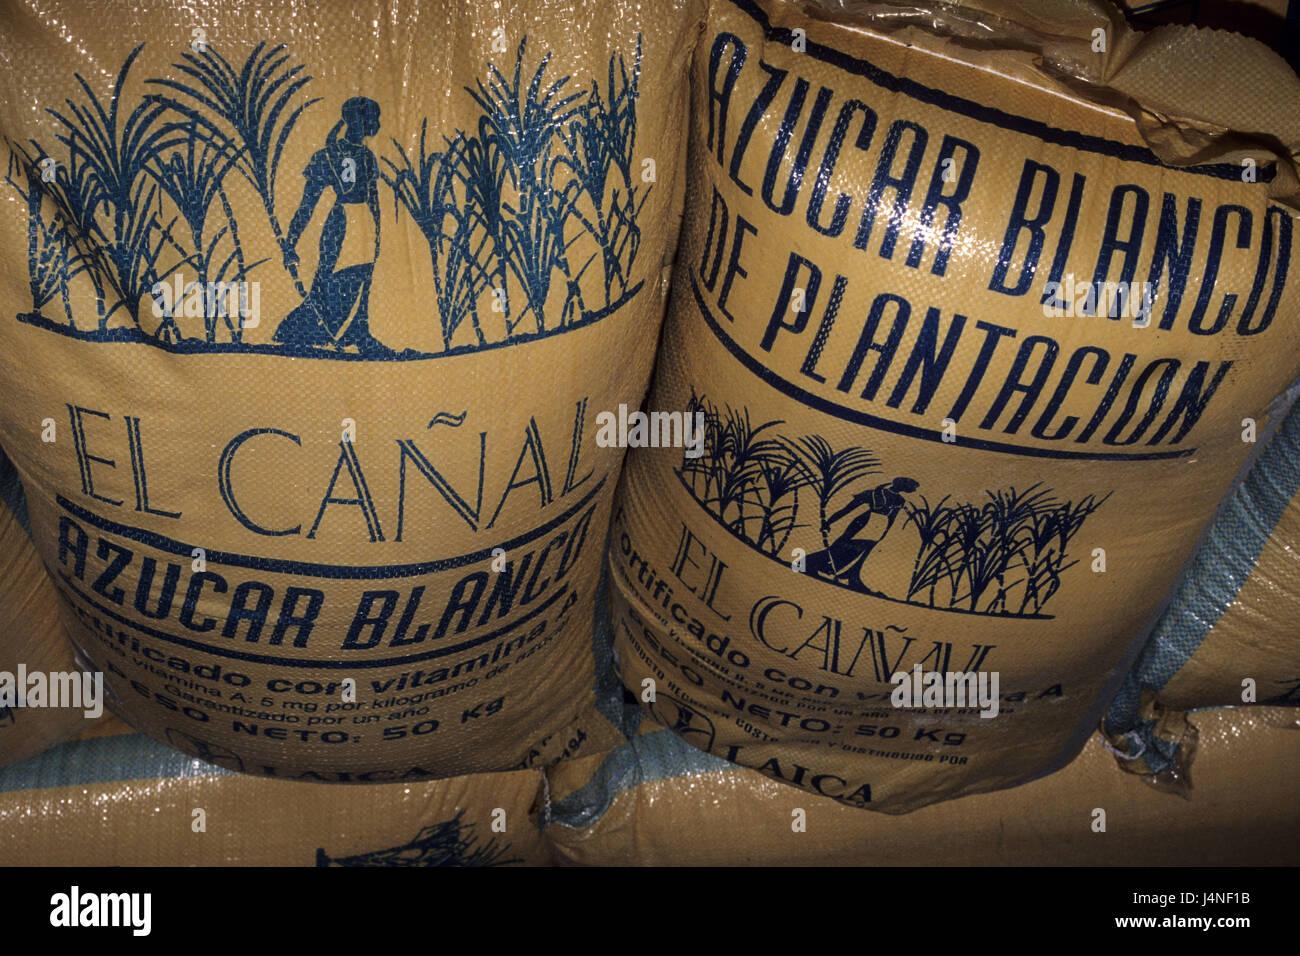 Costa Rica, San Isidro de tablespoons general, sugarcane, processing, - Stock Image